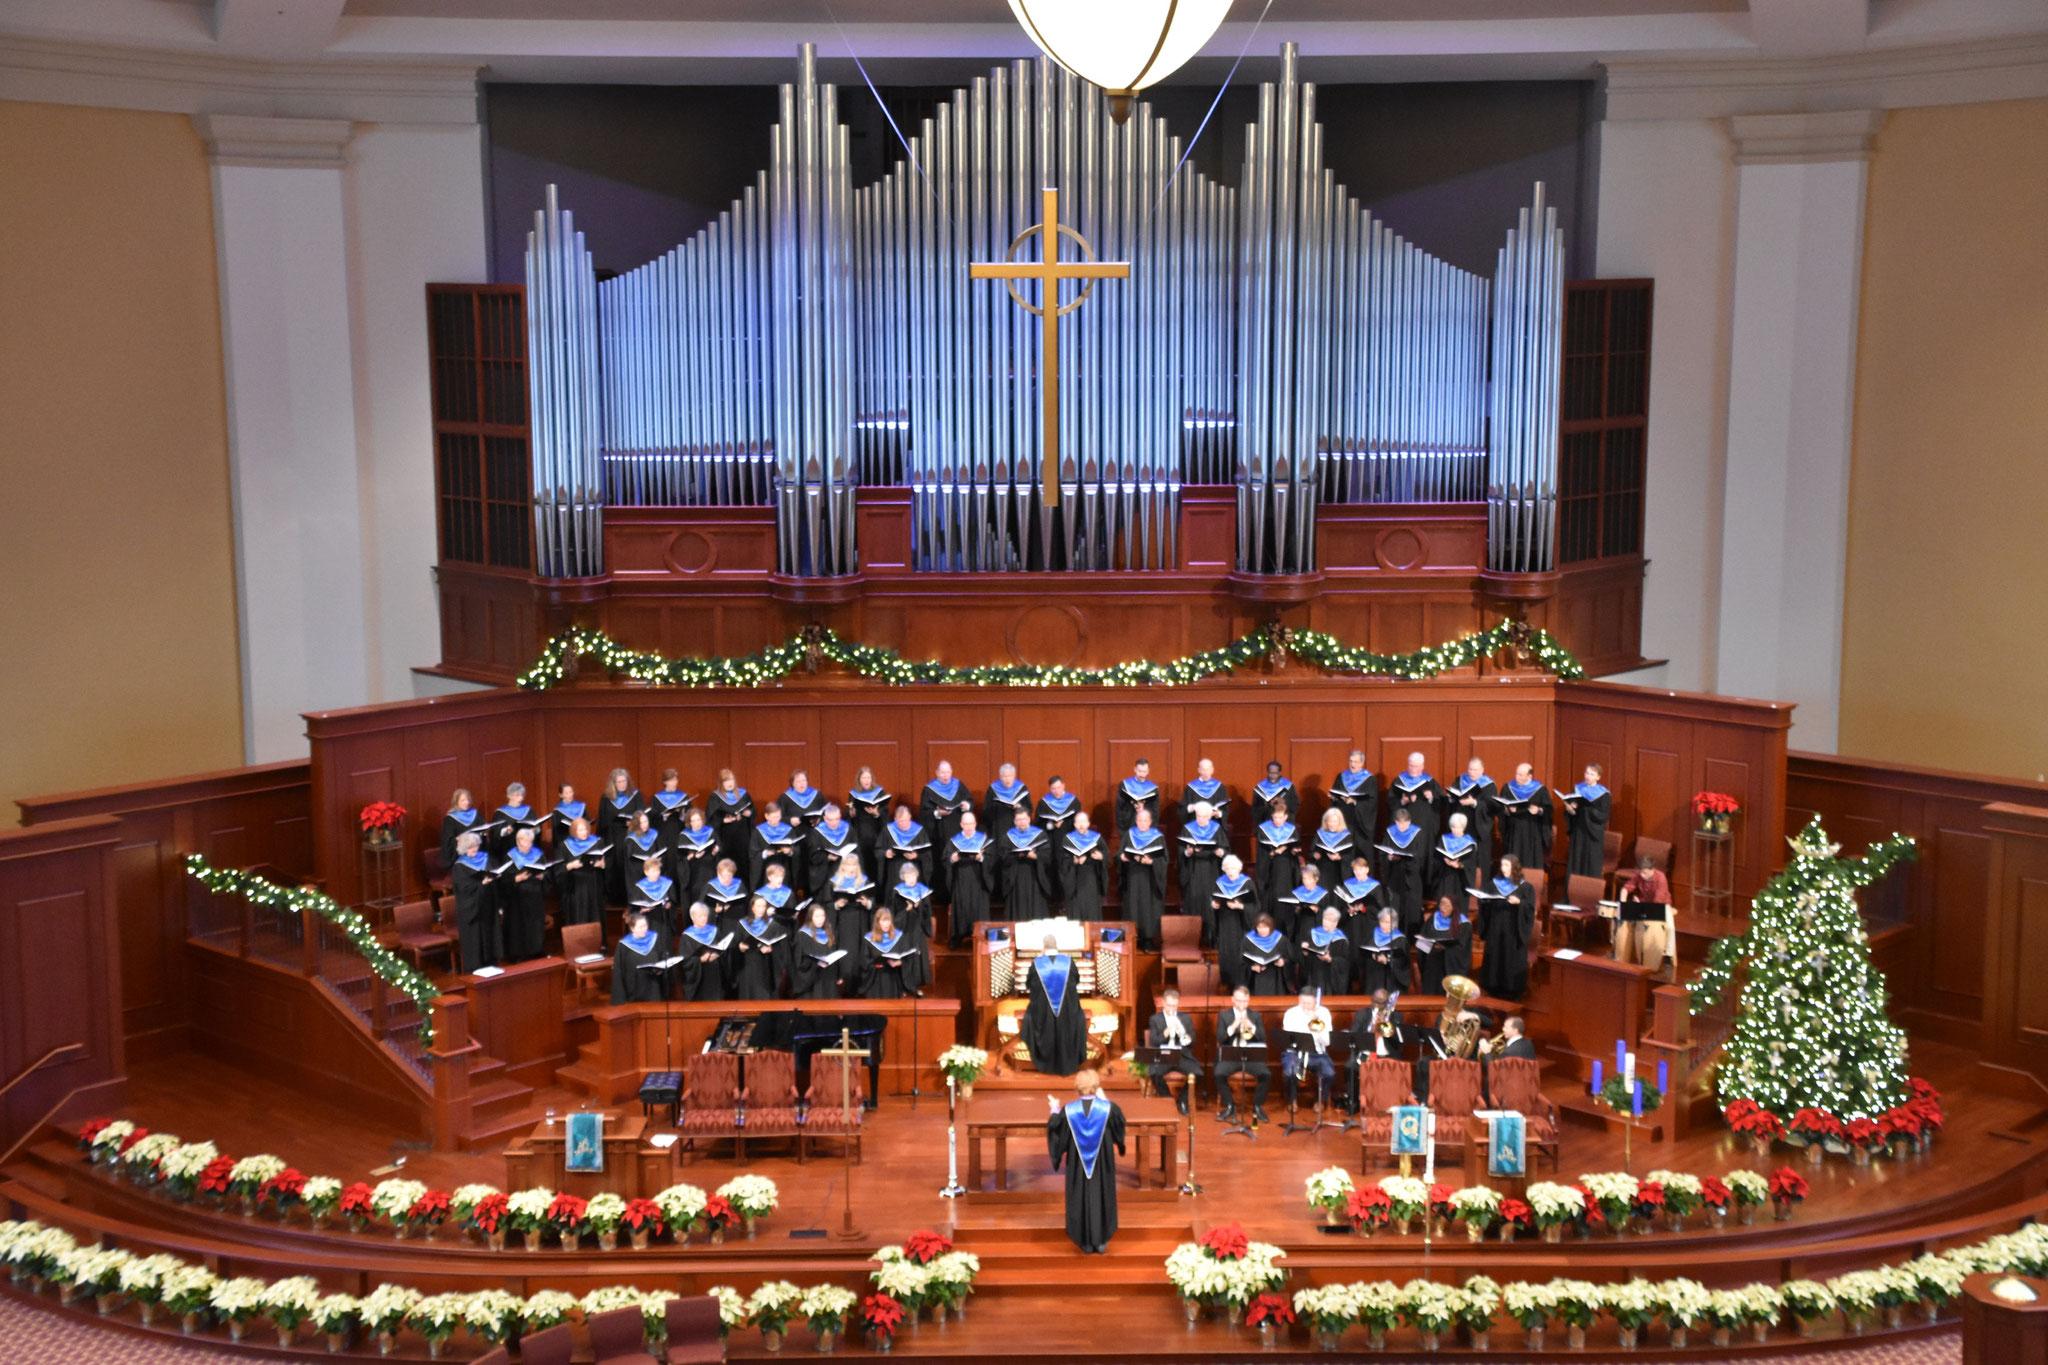 John's Creek UInited Methodist Church, Duluth, GA